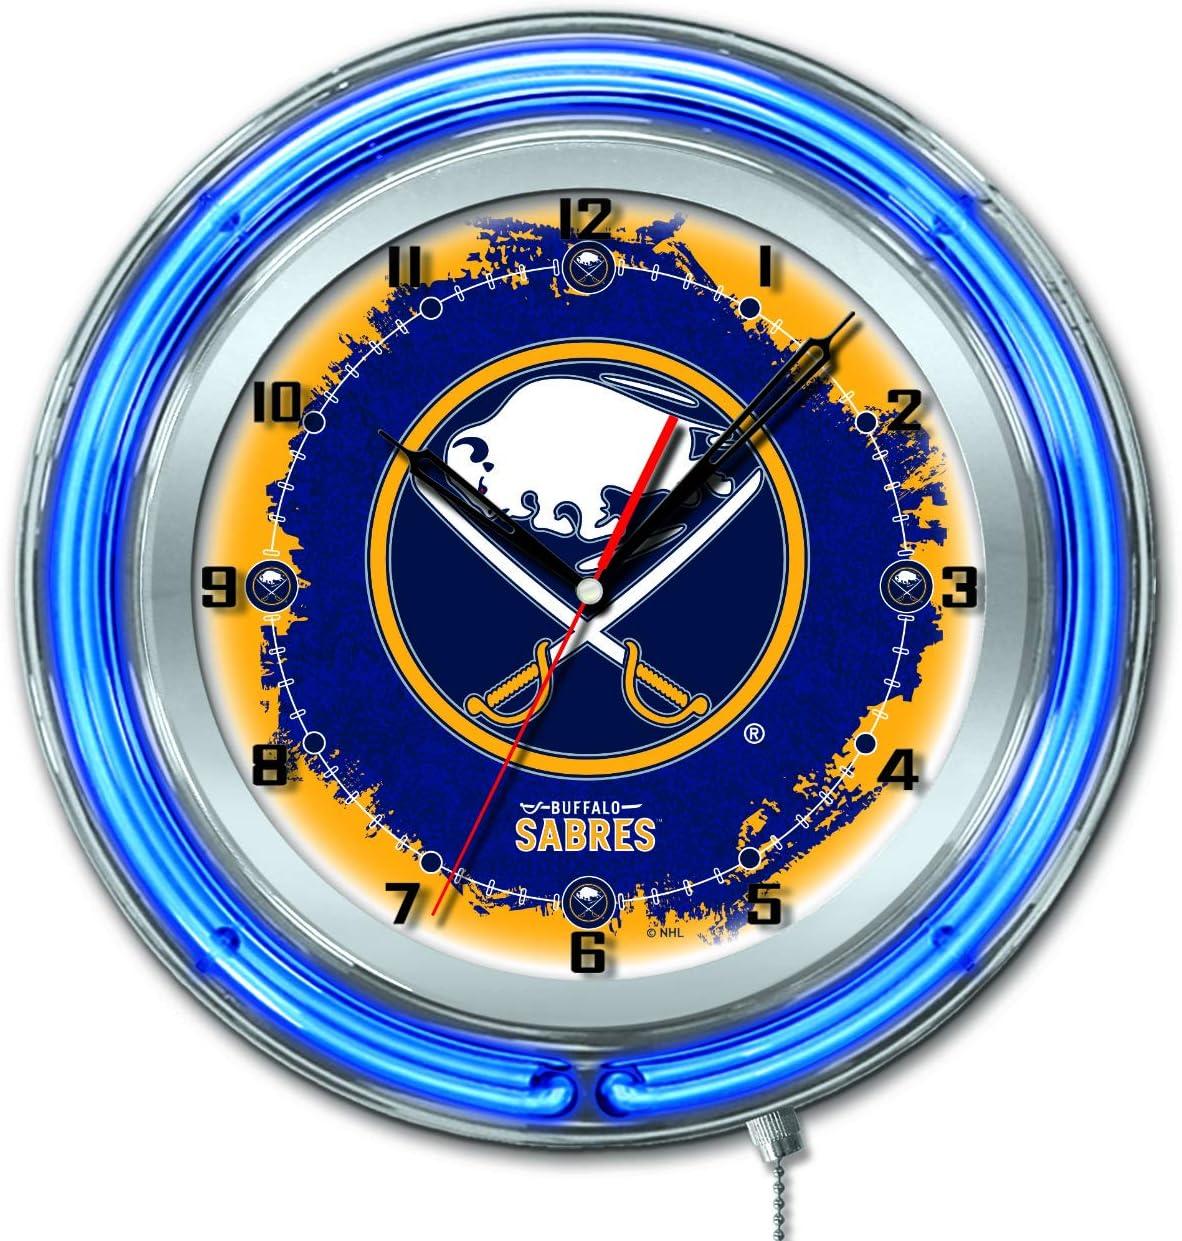 2021 autumn and winter new Holland trend rank Bar Stool Co. Buffalo Sabres Blue Neon Hockey HBS Batter